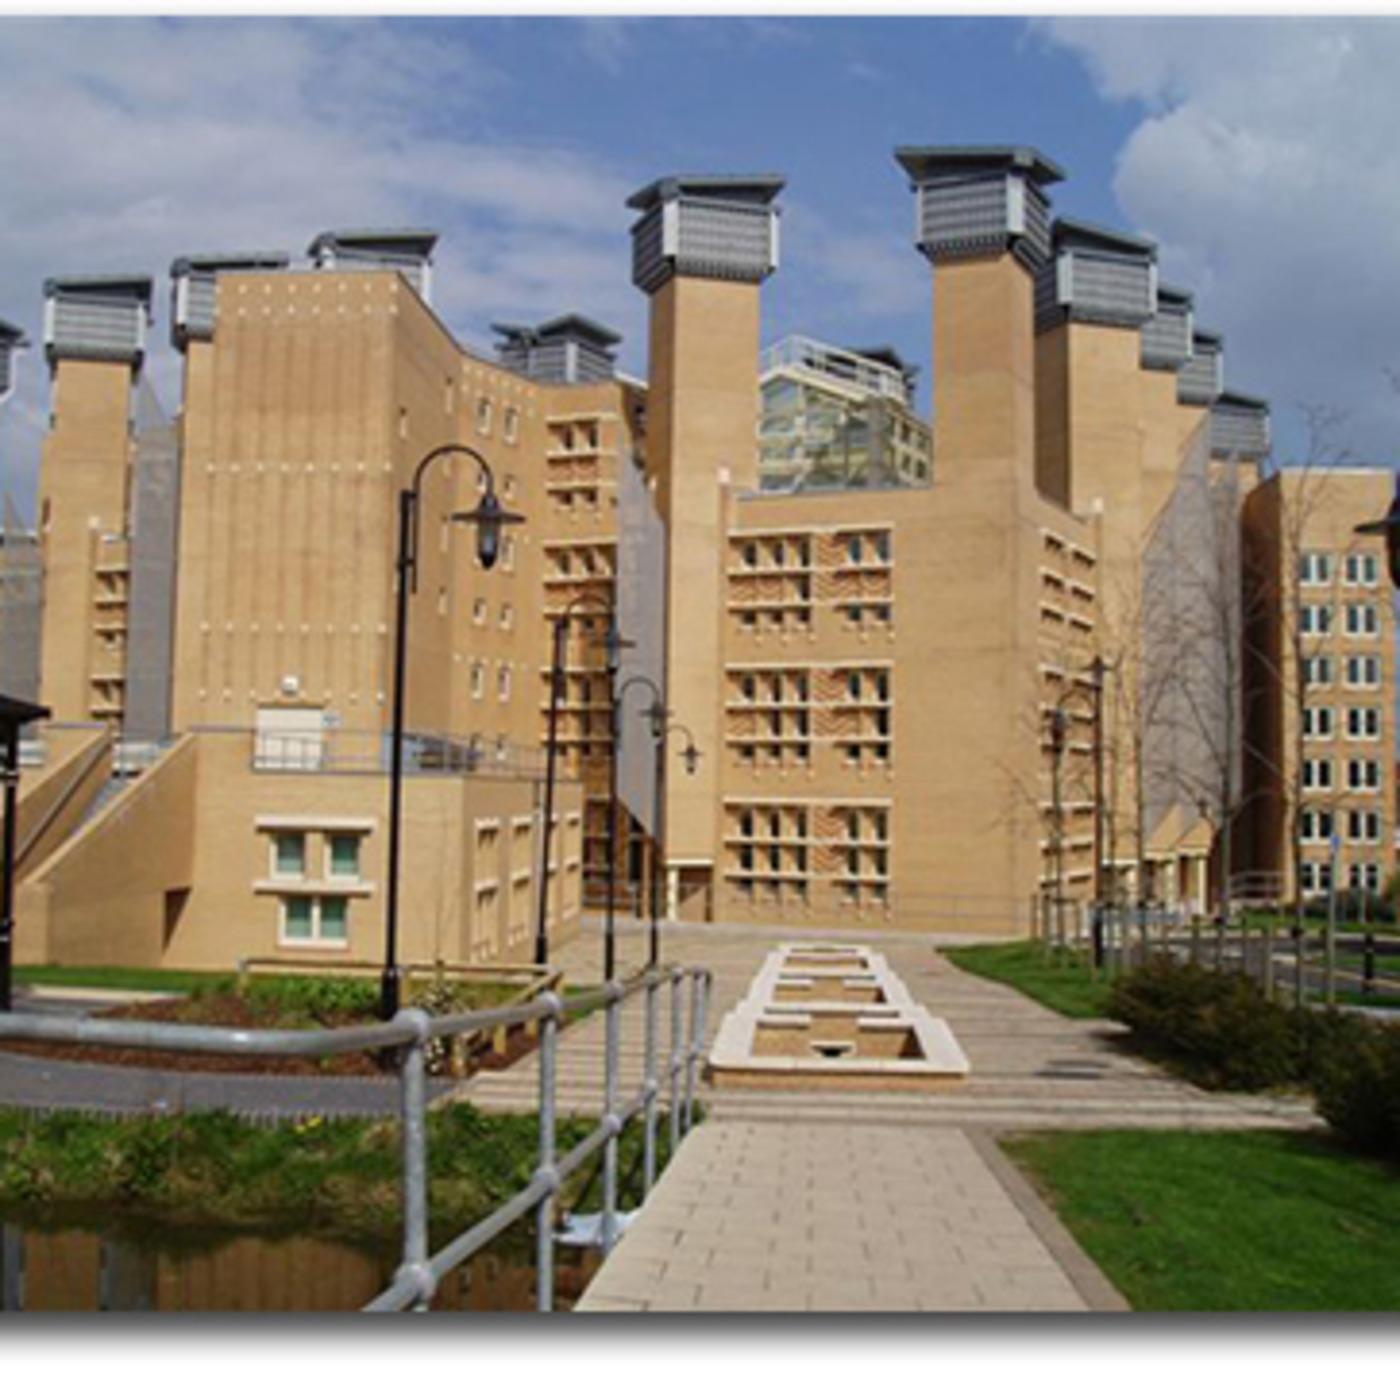 Curtin University Phd Thesis